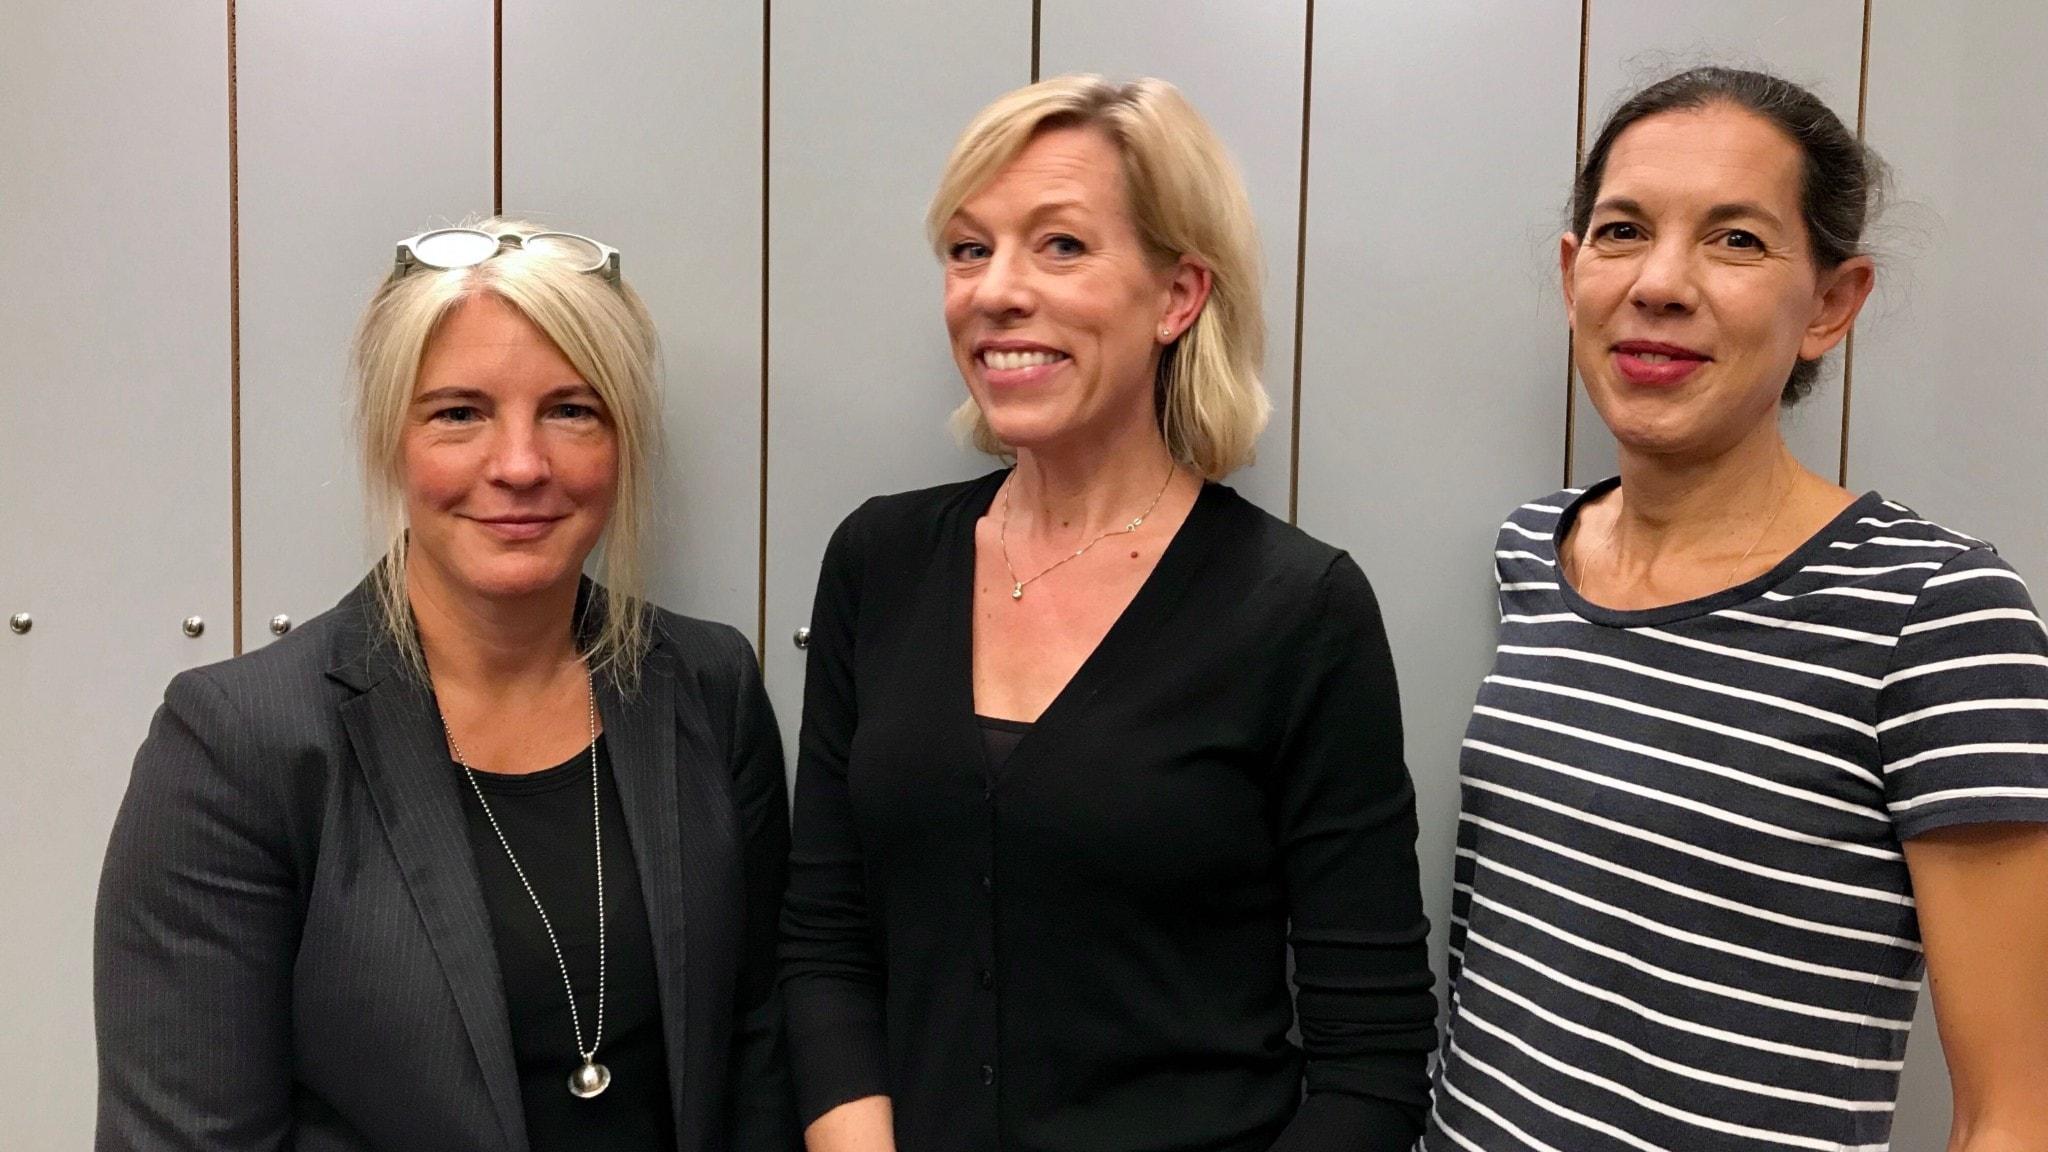 Sara Stenholm Pihl, Ginna Lindberg och Sanna Torén Björling.